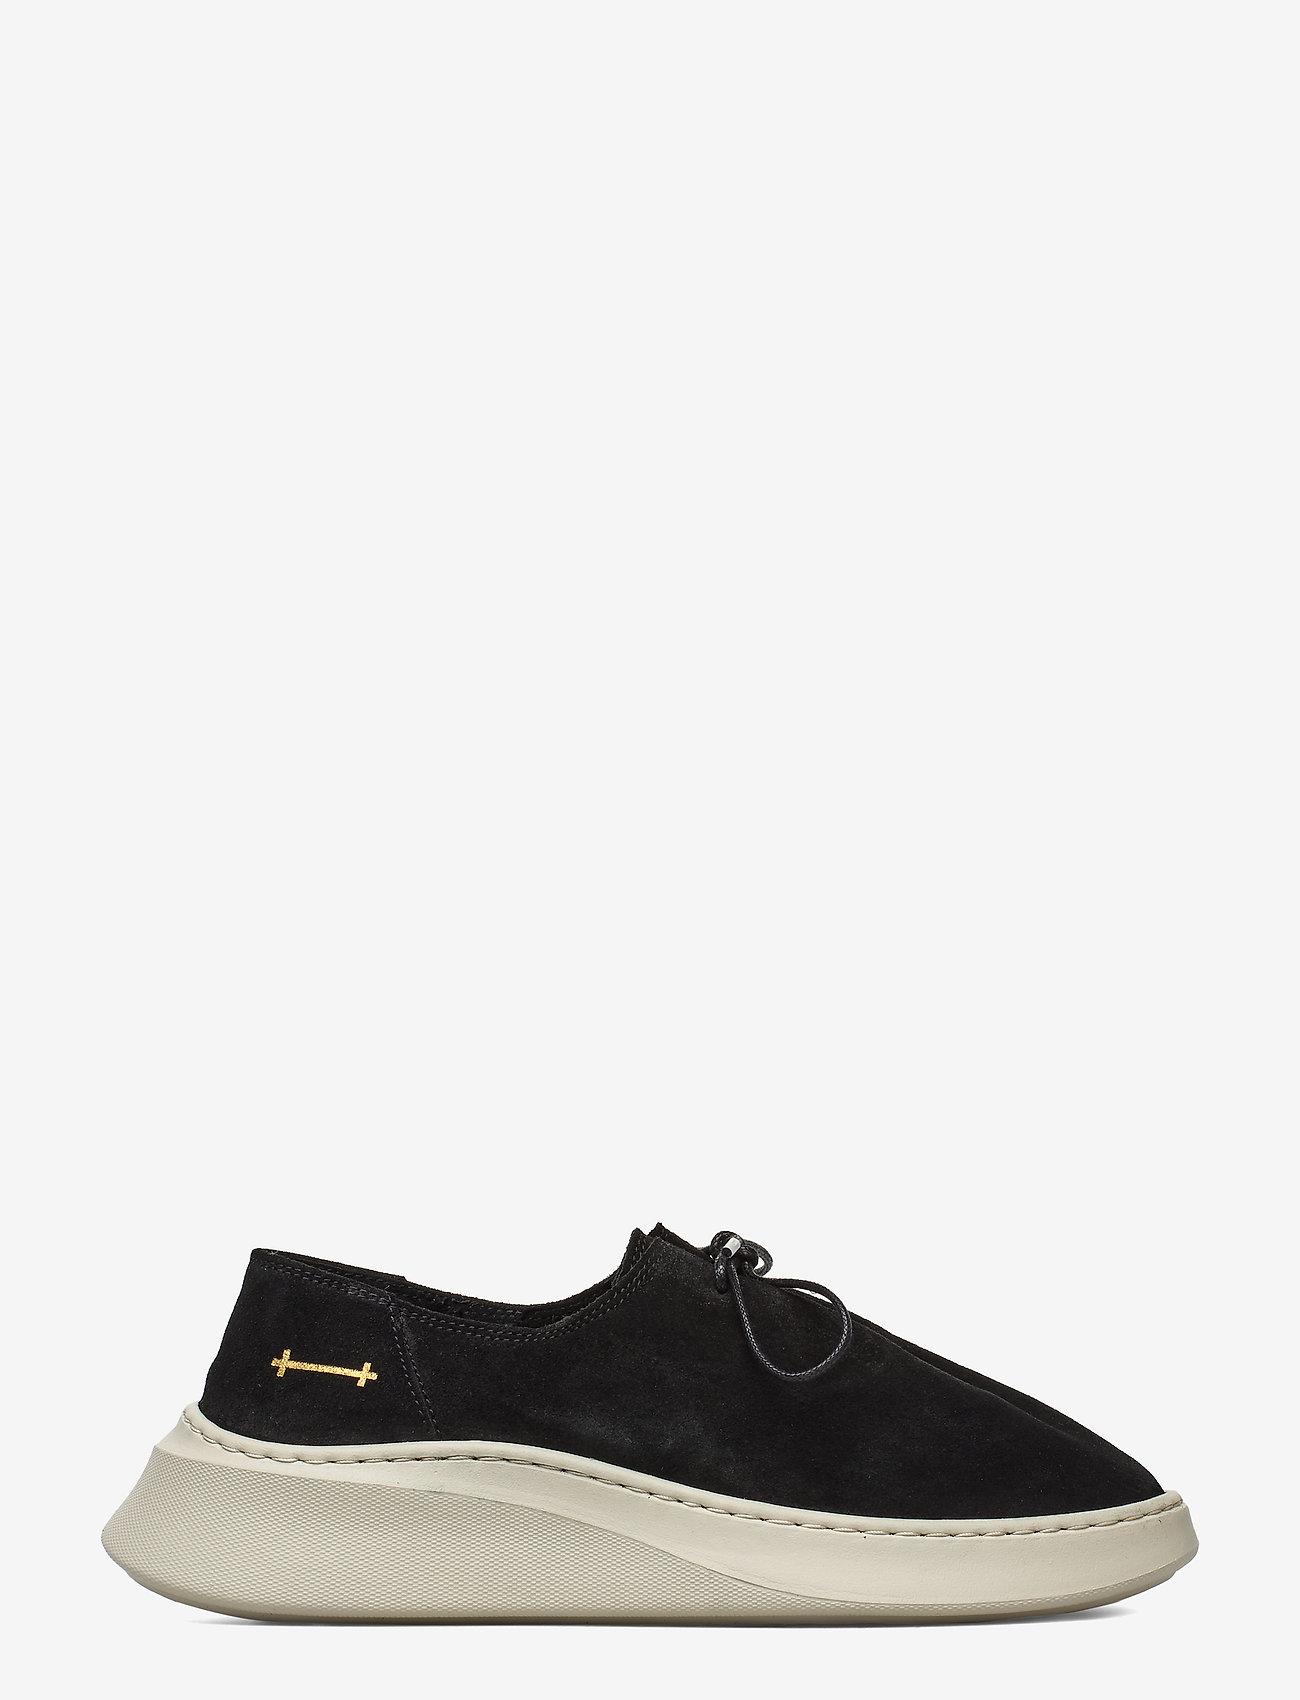 Gram - yatfai sneaker black suede - buty sznurowane - black - 1